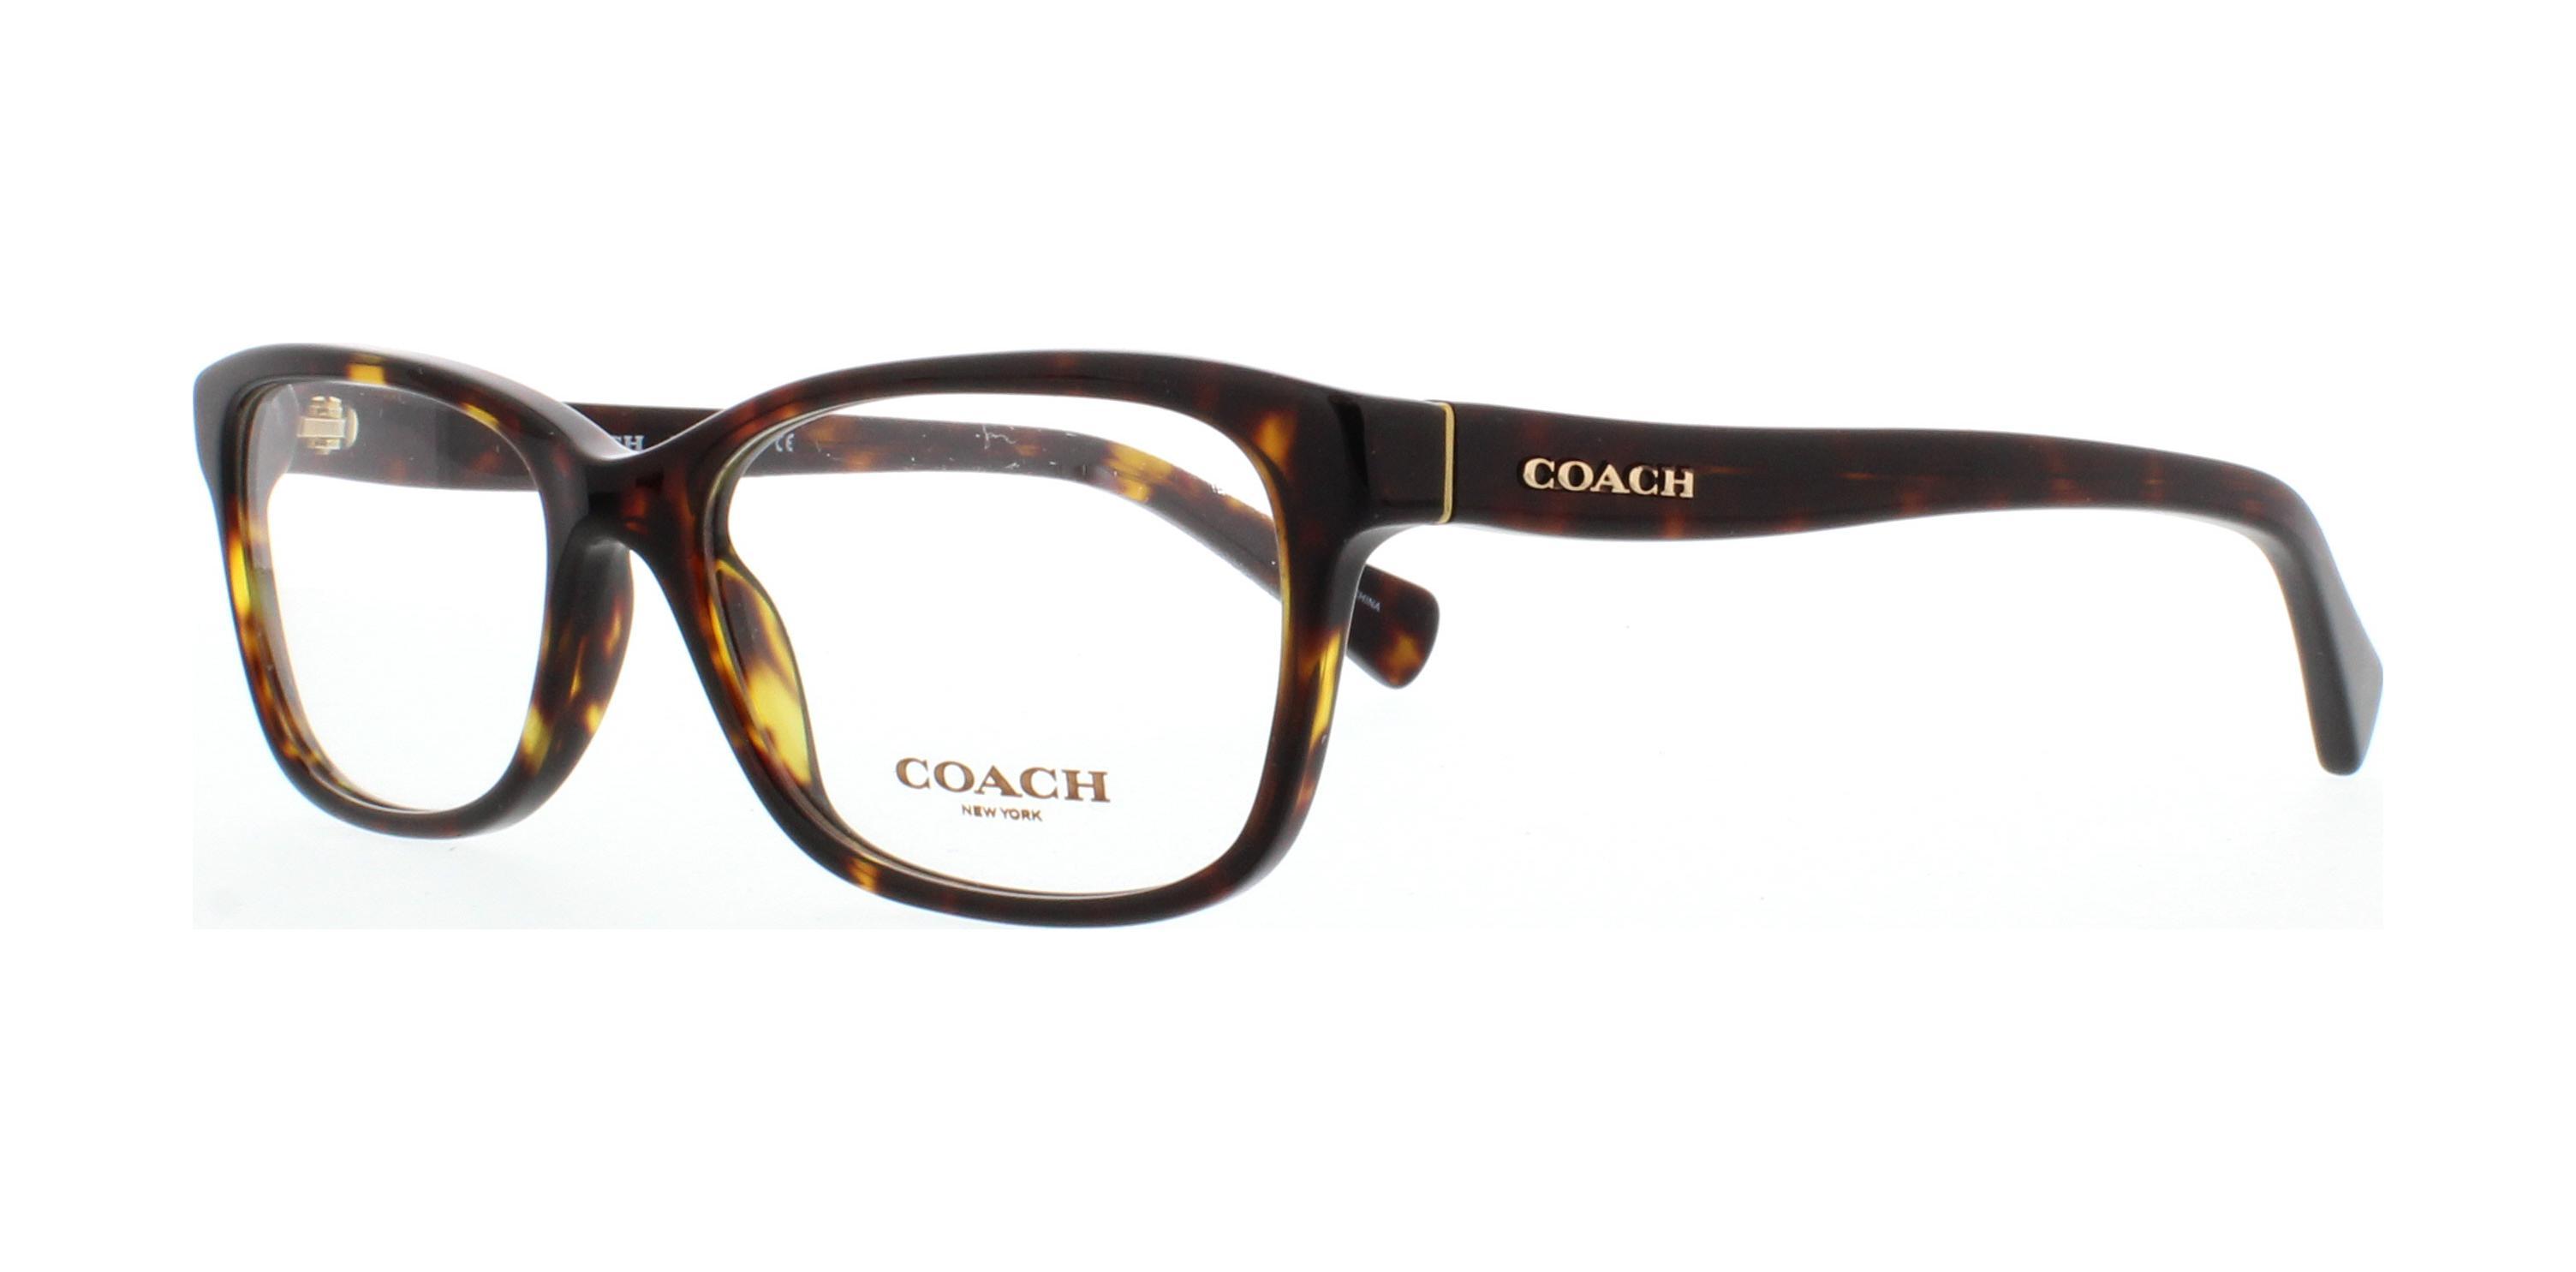 f693bbf59a81 Coach Eyeglass Frames Women Outlet